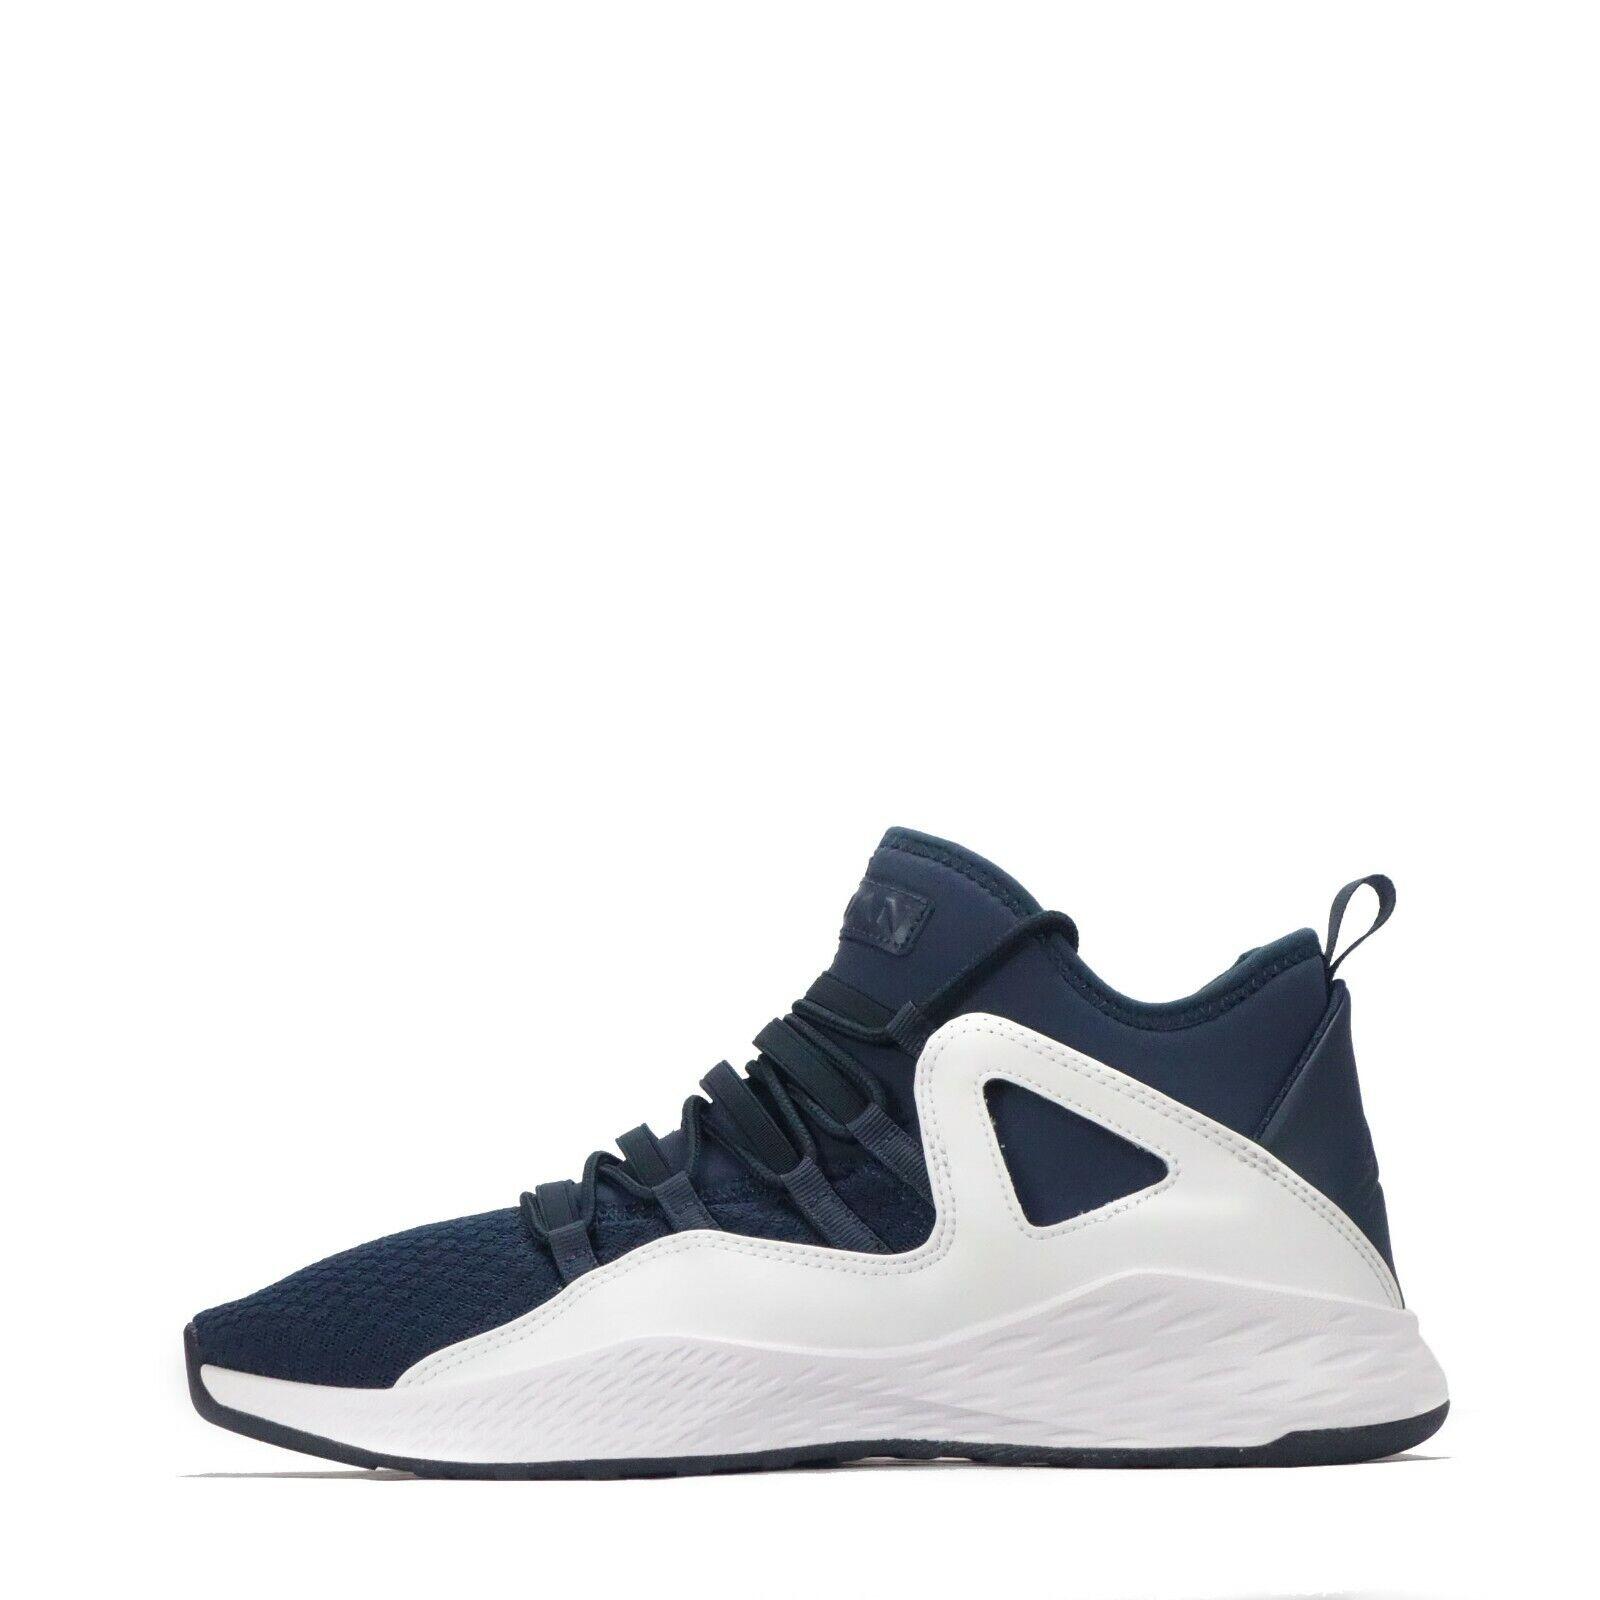 Nike Jordan Formula 23 Men's shoes Armory Navy White